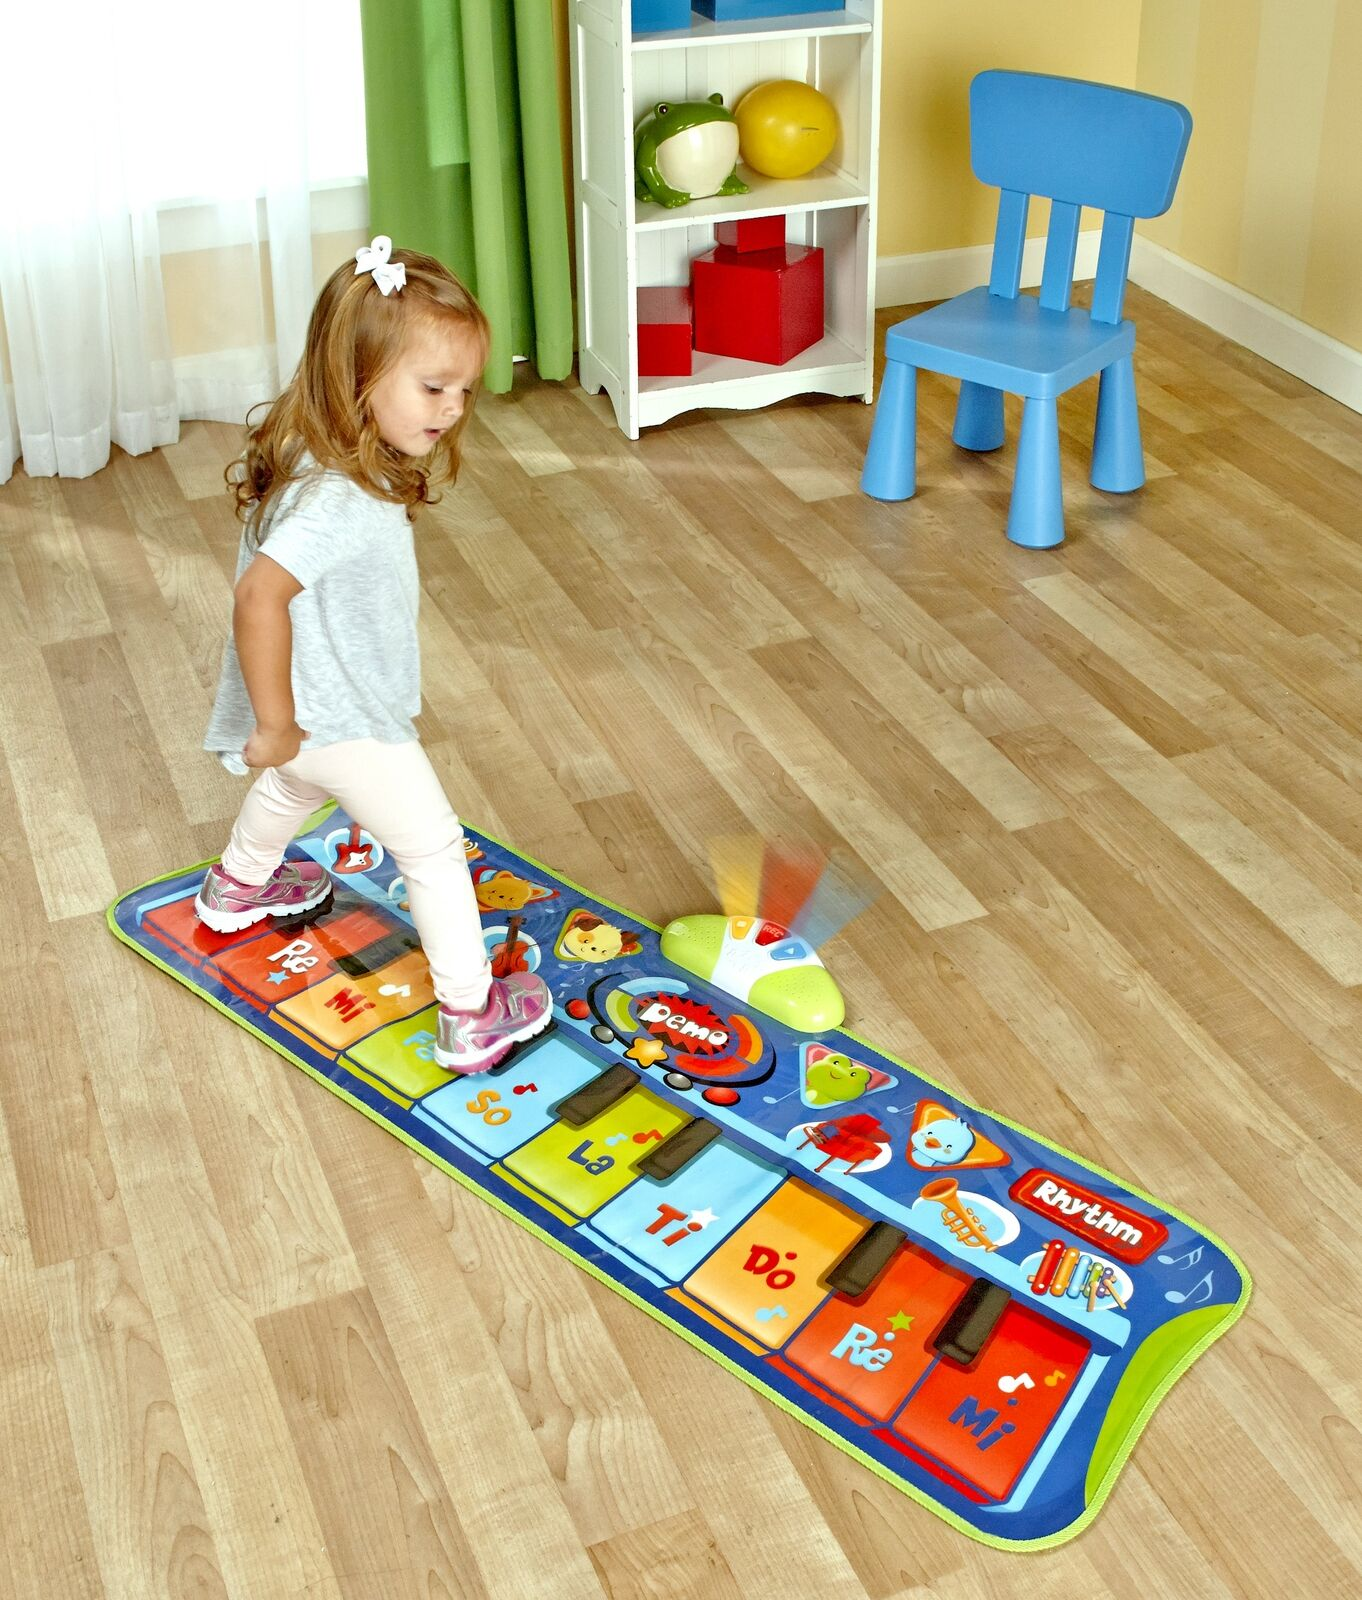 Dance Floor Mat Carpet Kids Electronic Interactive Alphabet Wall Chart Touch Playmat Best Educational Toys for Baby Toddler Girls Boys 34 x 30 in aPerfectLife Kids Musical Mats